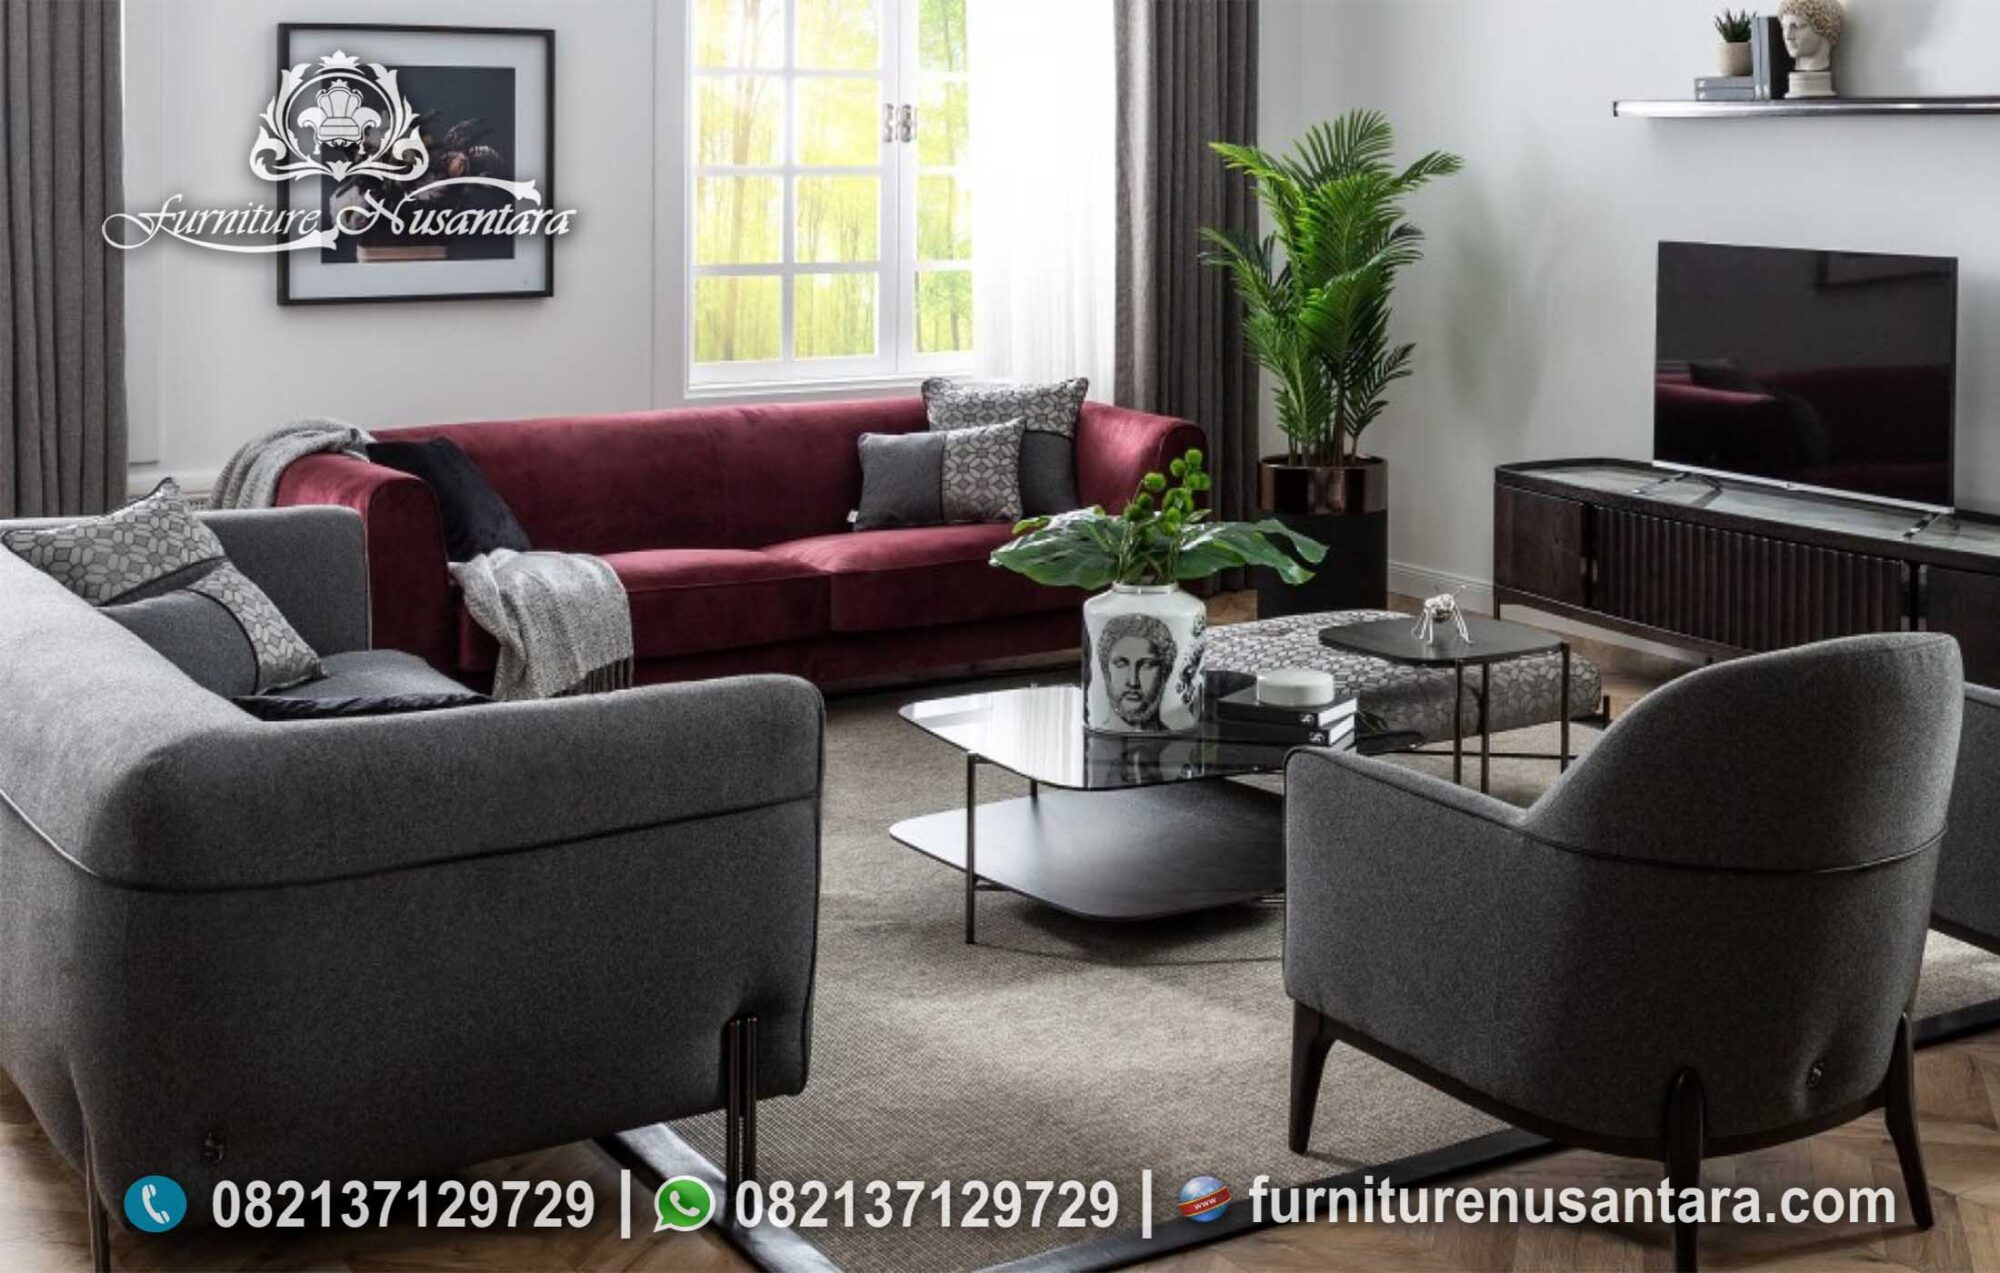 New Desain Sofa Stylist Modern ST-104, Furniture Nusantara